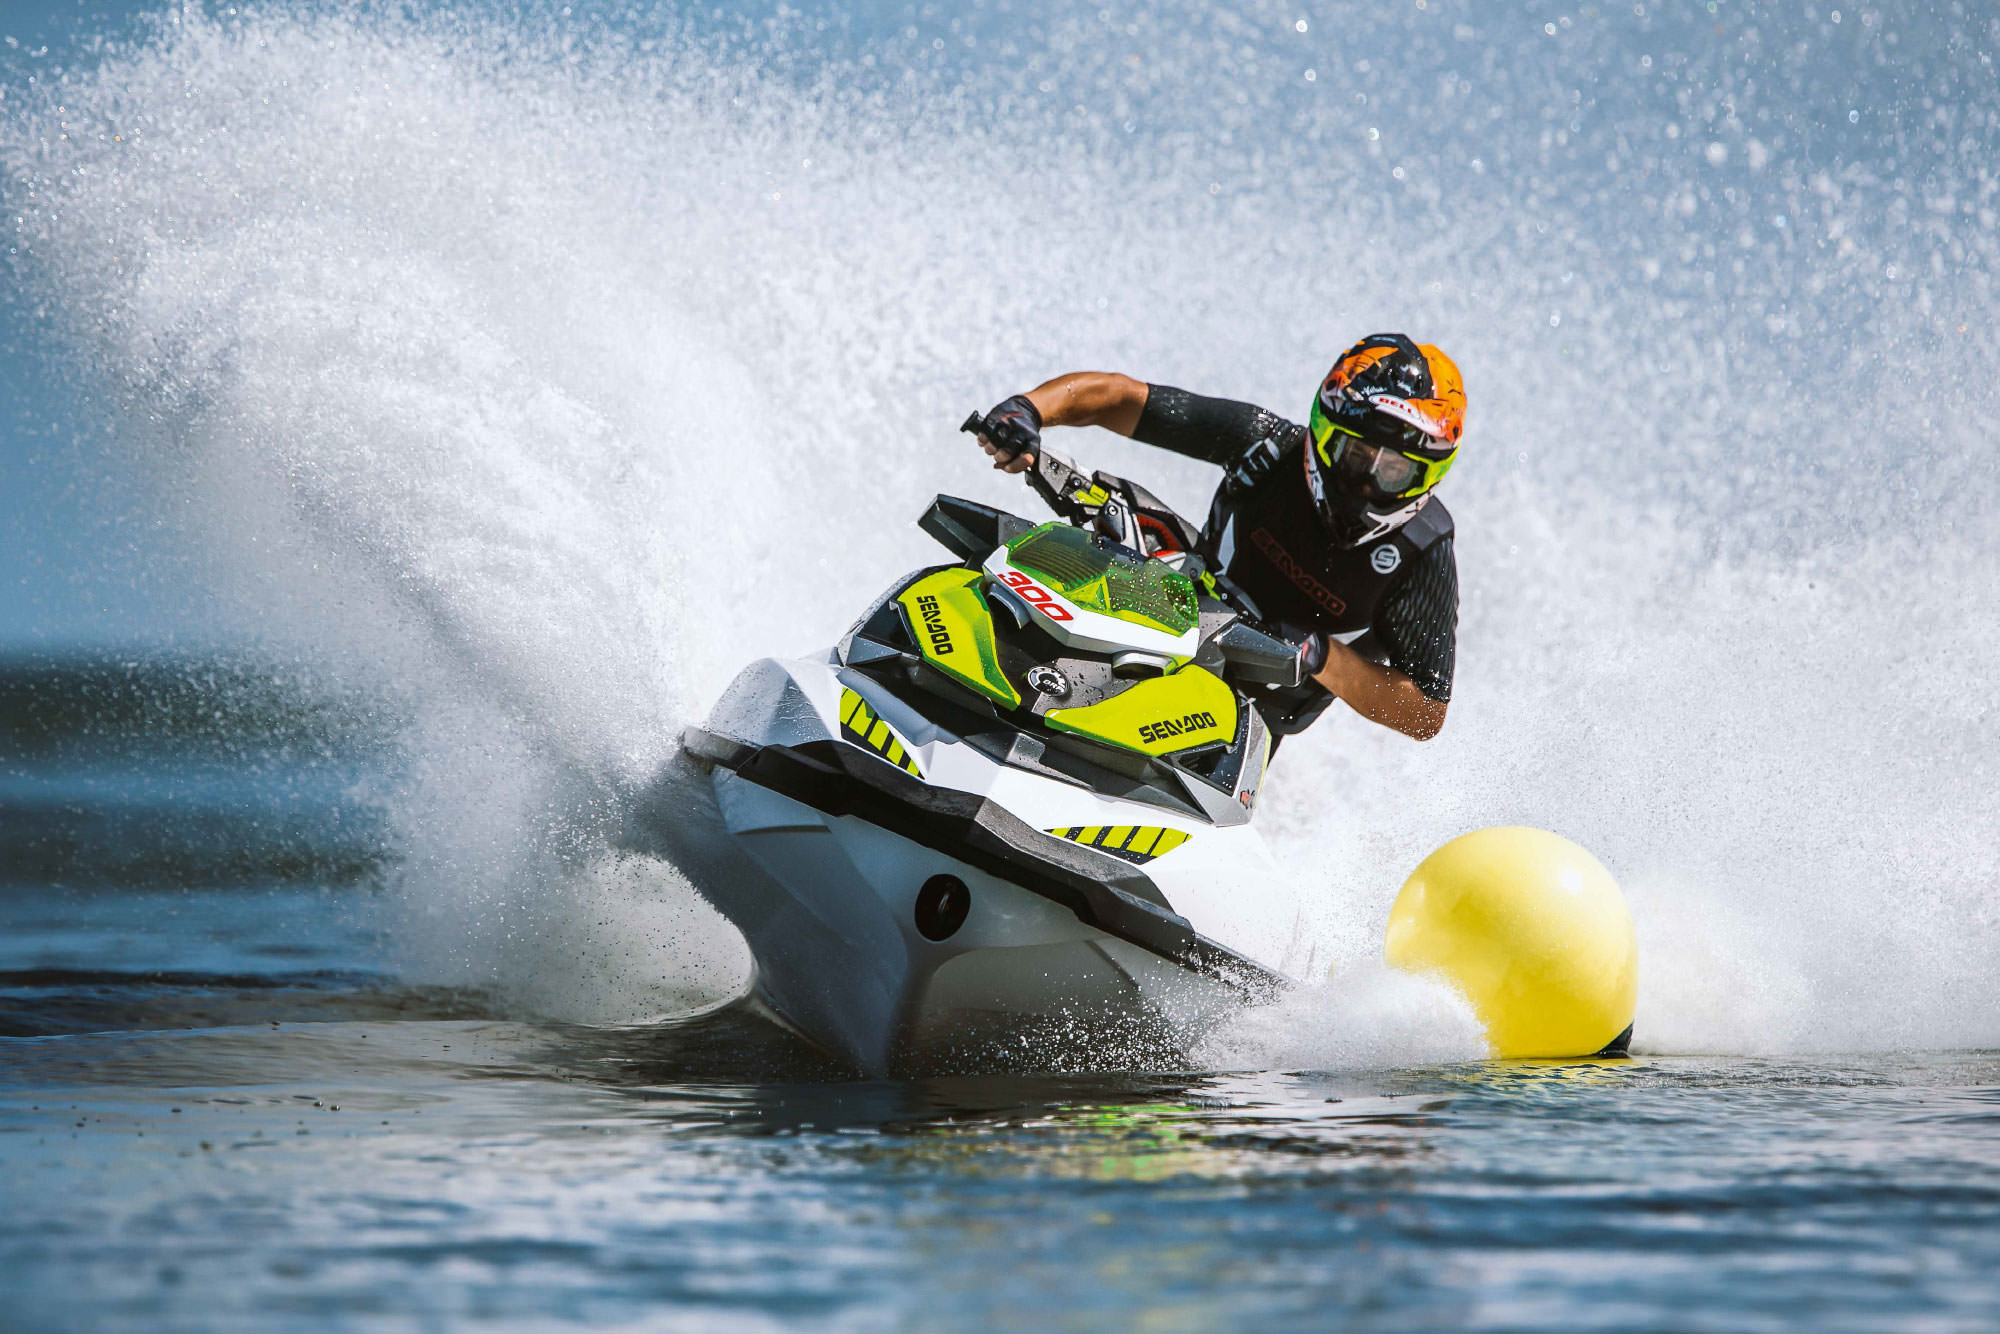 Seadoo Prices >> Rent Jet Ski in Mallorca | Hire a SeaDoo | Portals Nous | Port Adriano